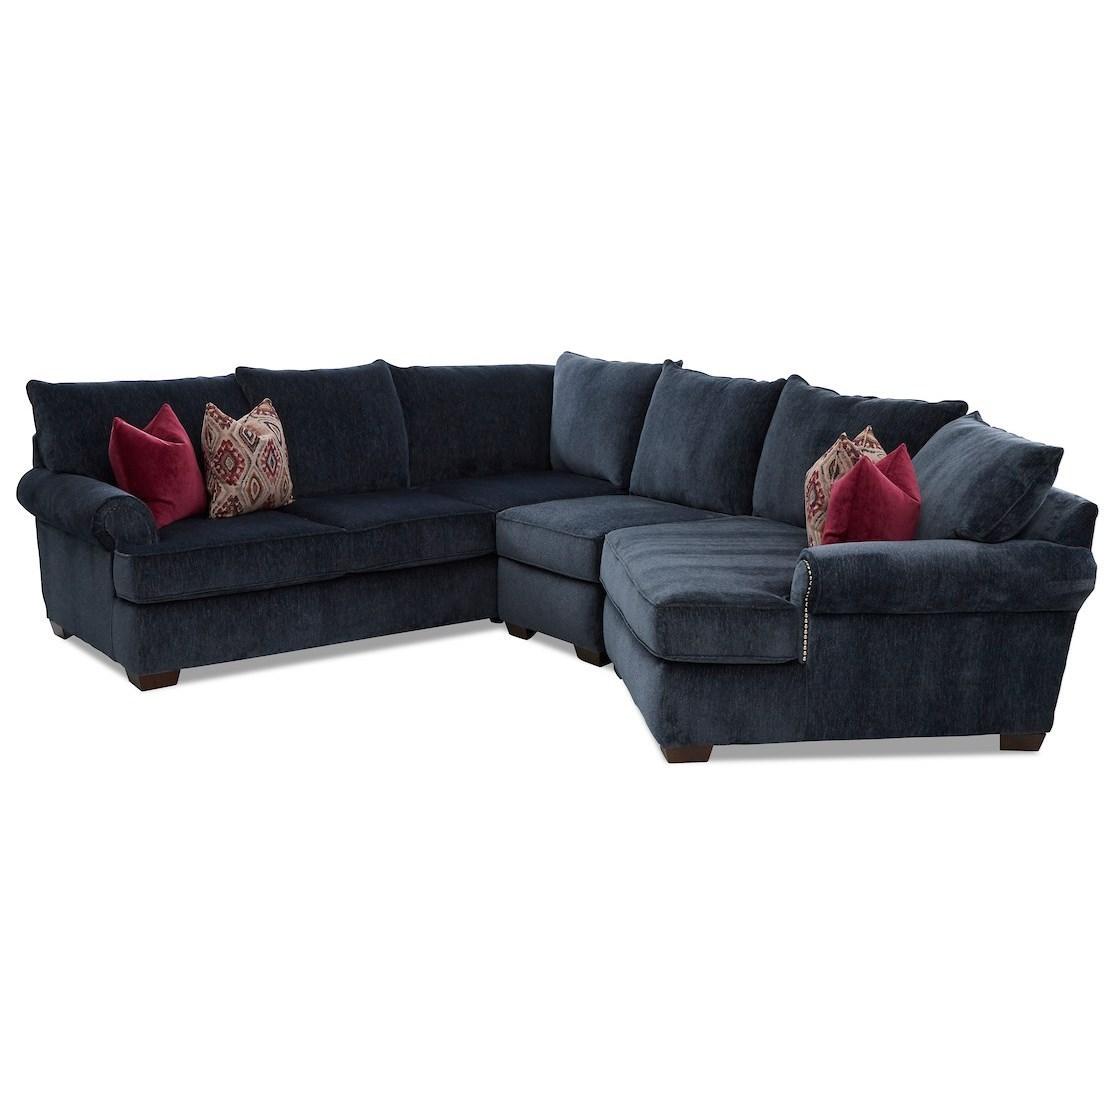 4 seat sectional sofa